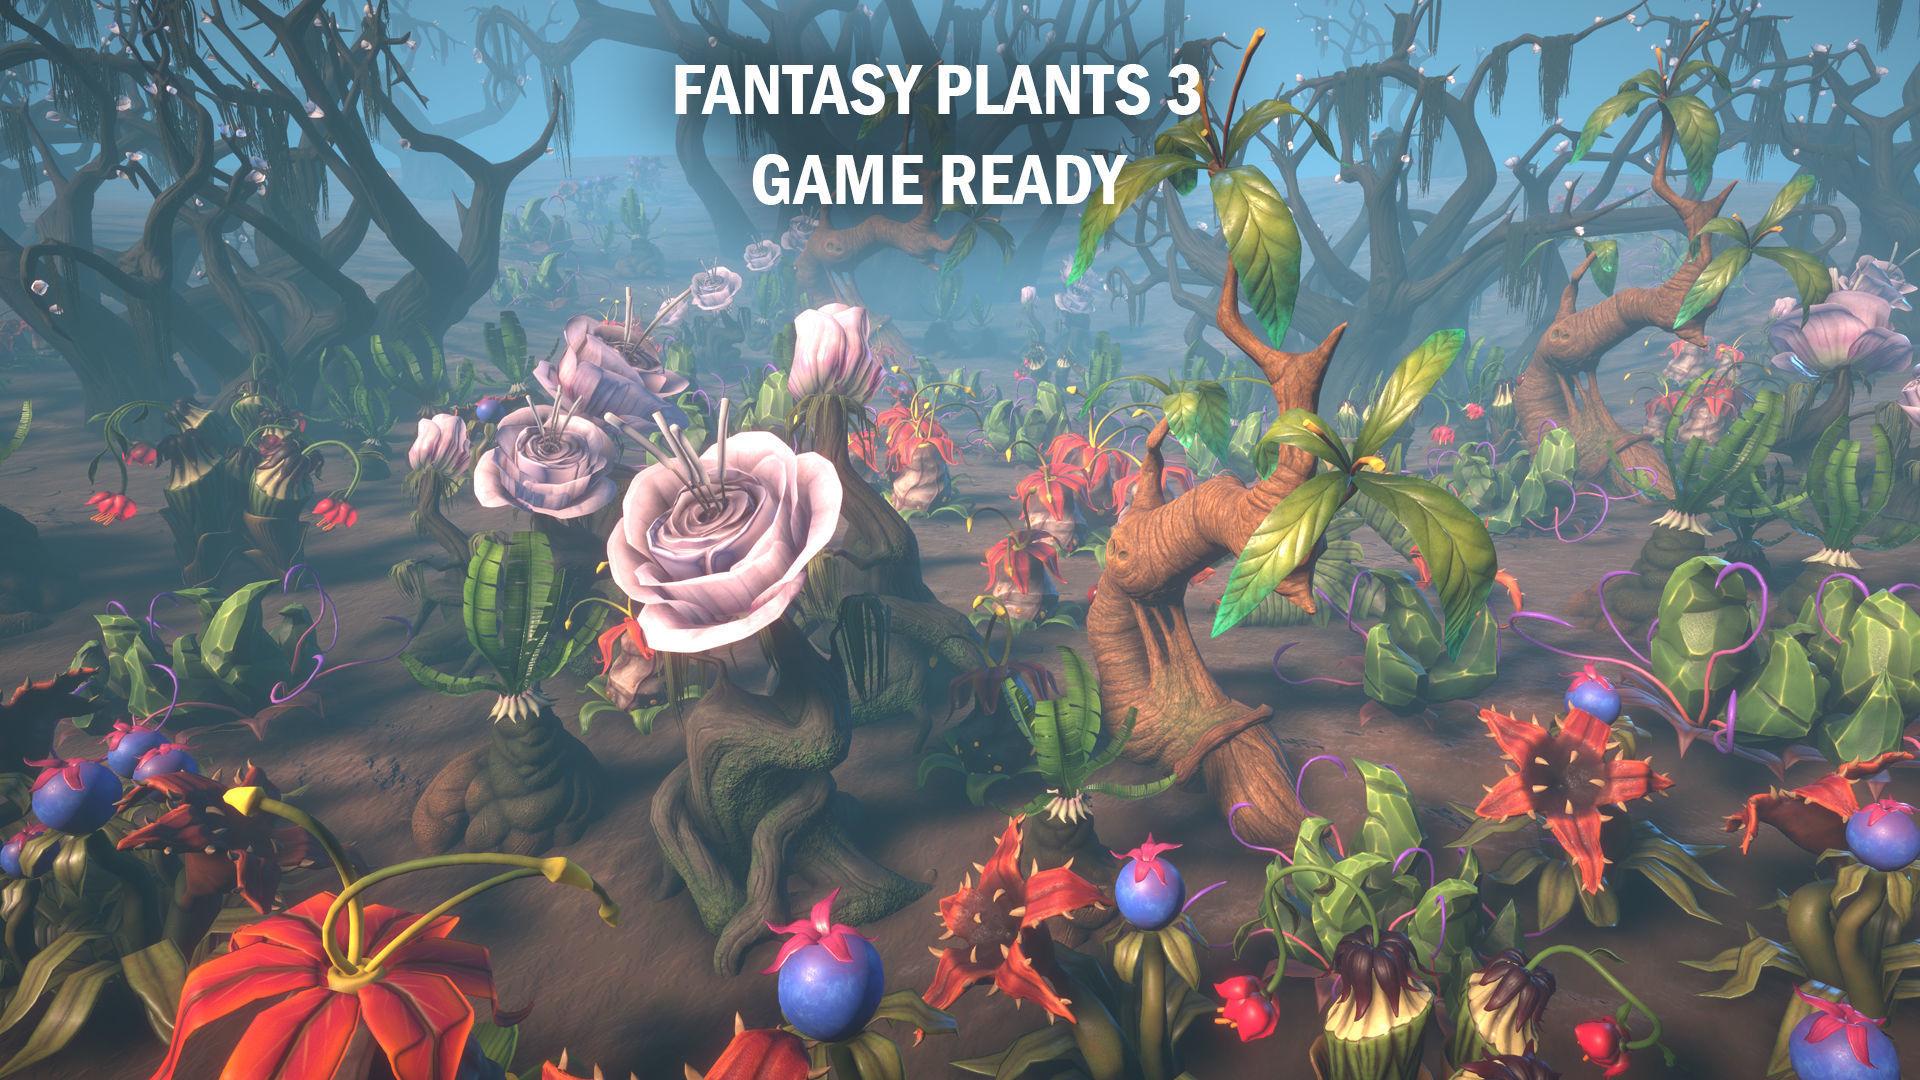 Fantasy plants 3